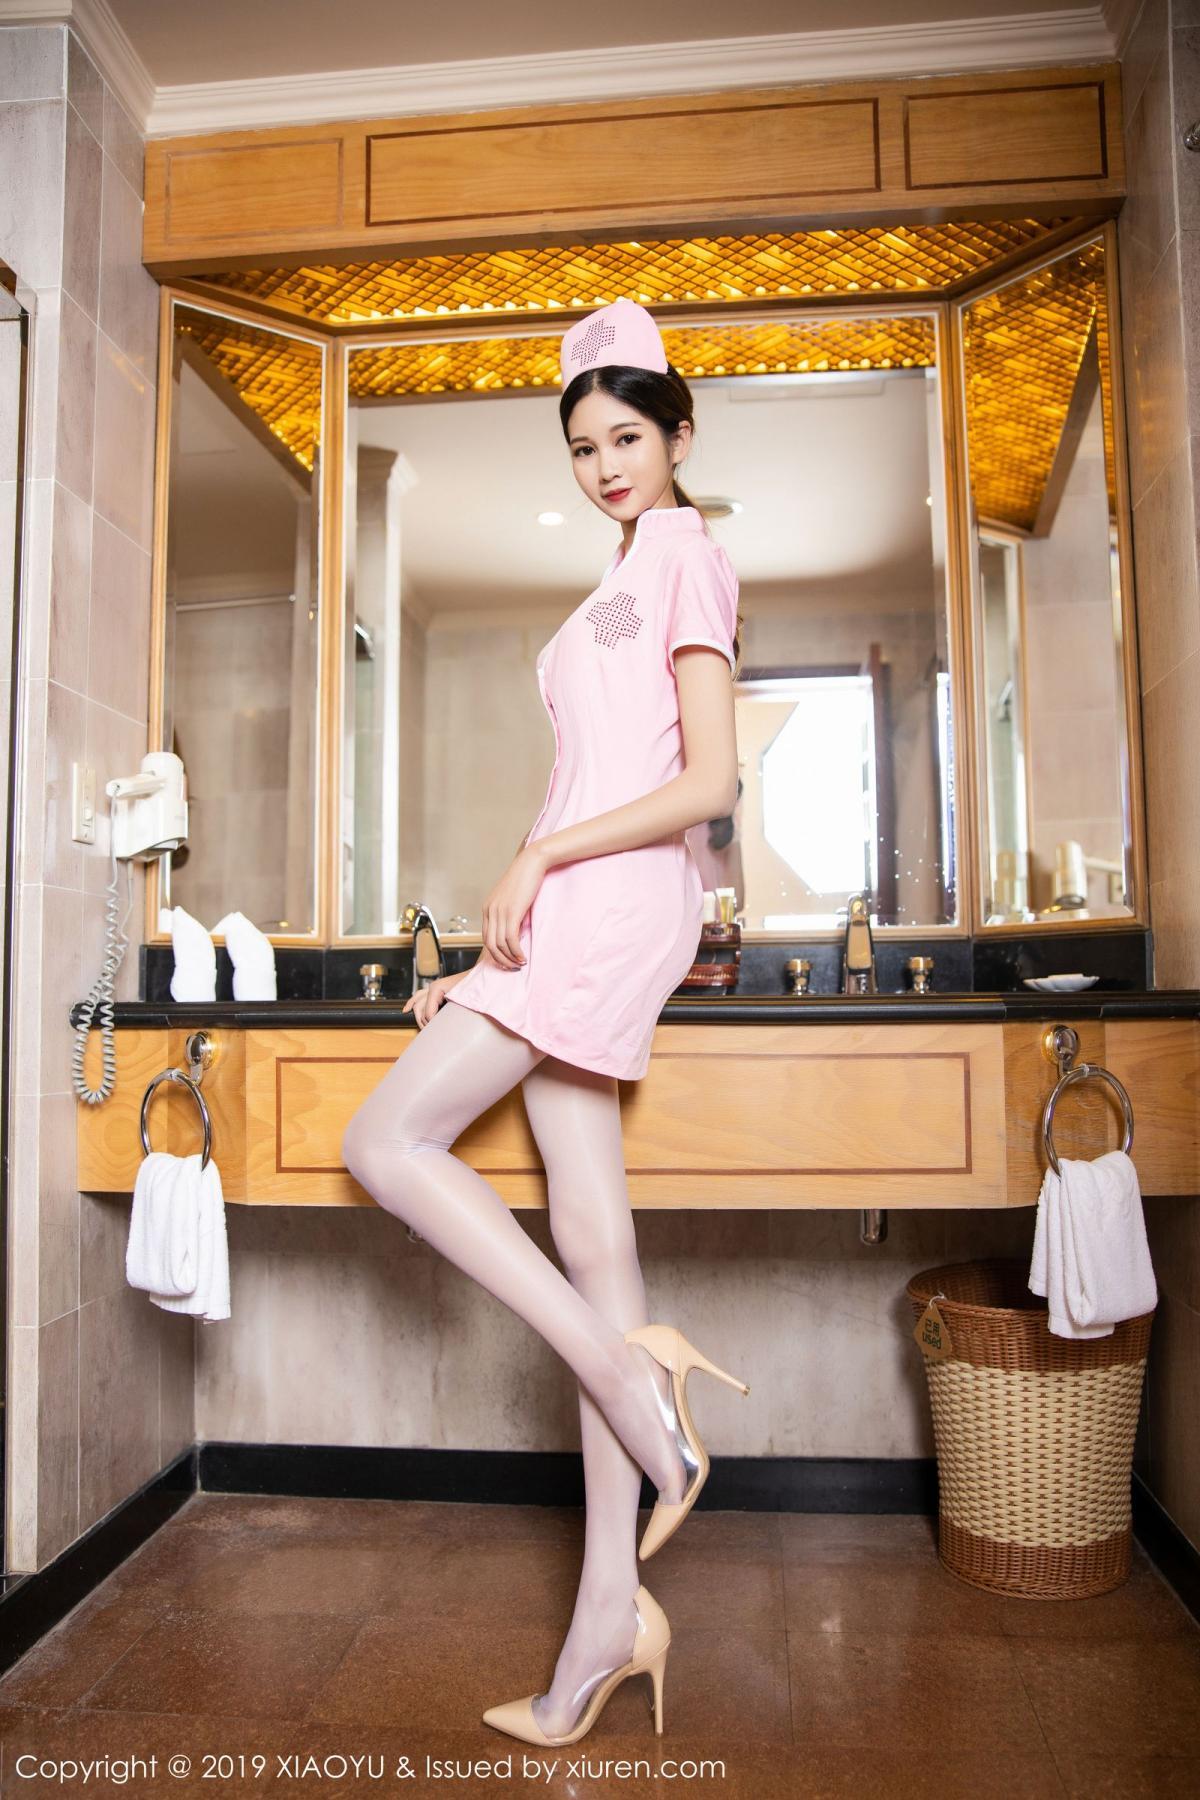 [XiaoYu] Vol.218 Cheng Cheng Cheng 2P, Cheng Cheng Cheng, Nurse, Tall, XiaoYu